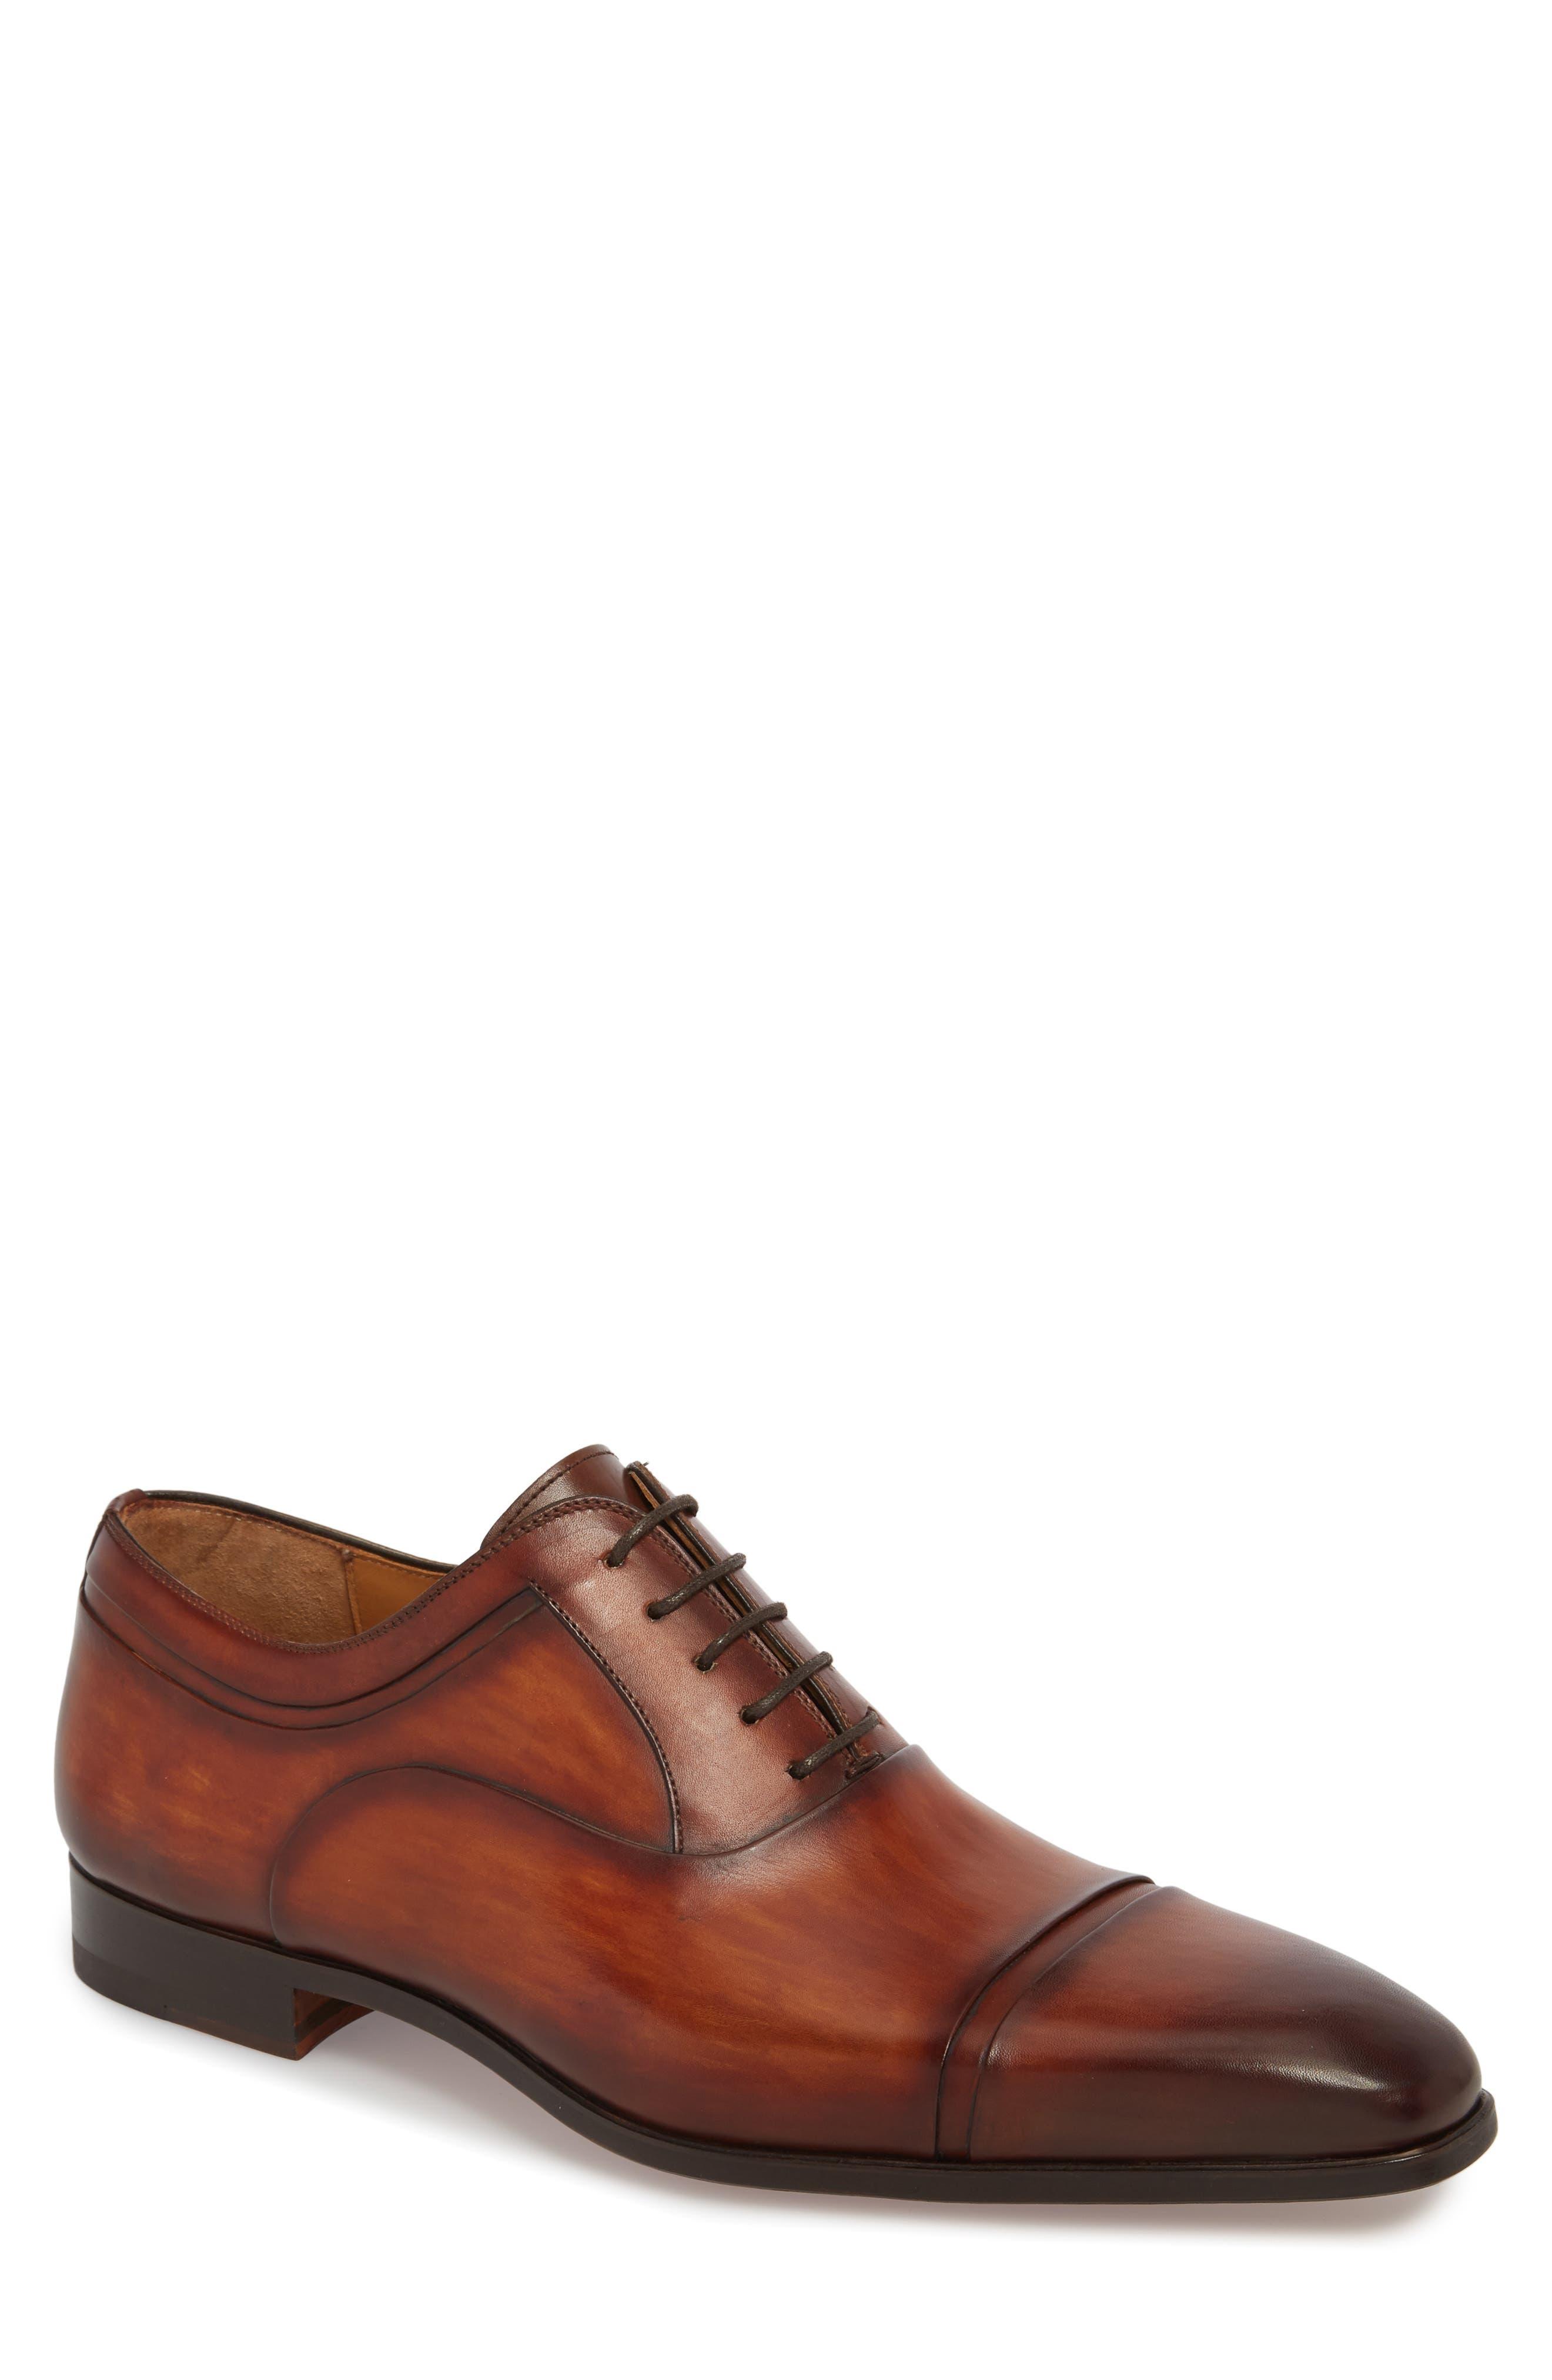 Tobin Cap Toe Oxford,                         Main,                         color, Cognac Leather